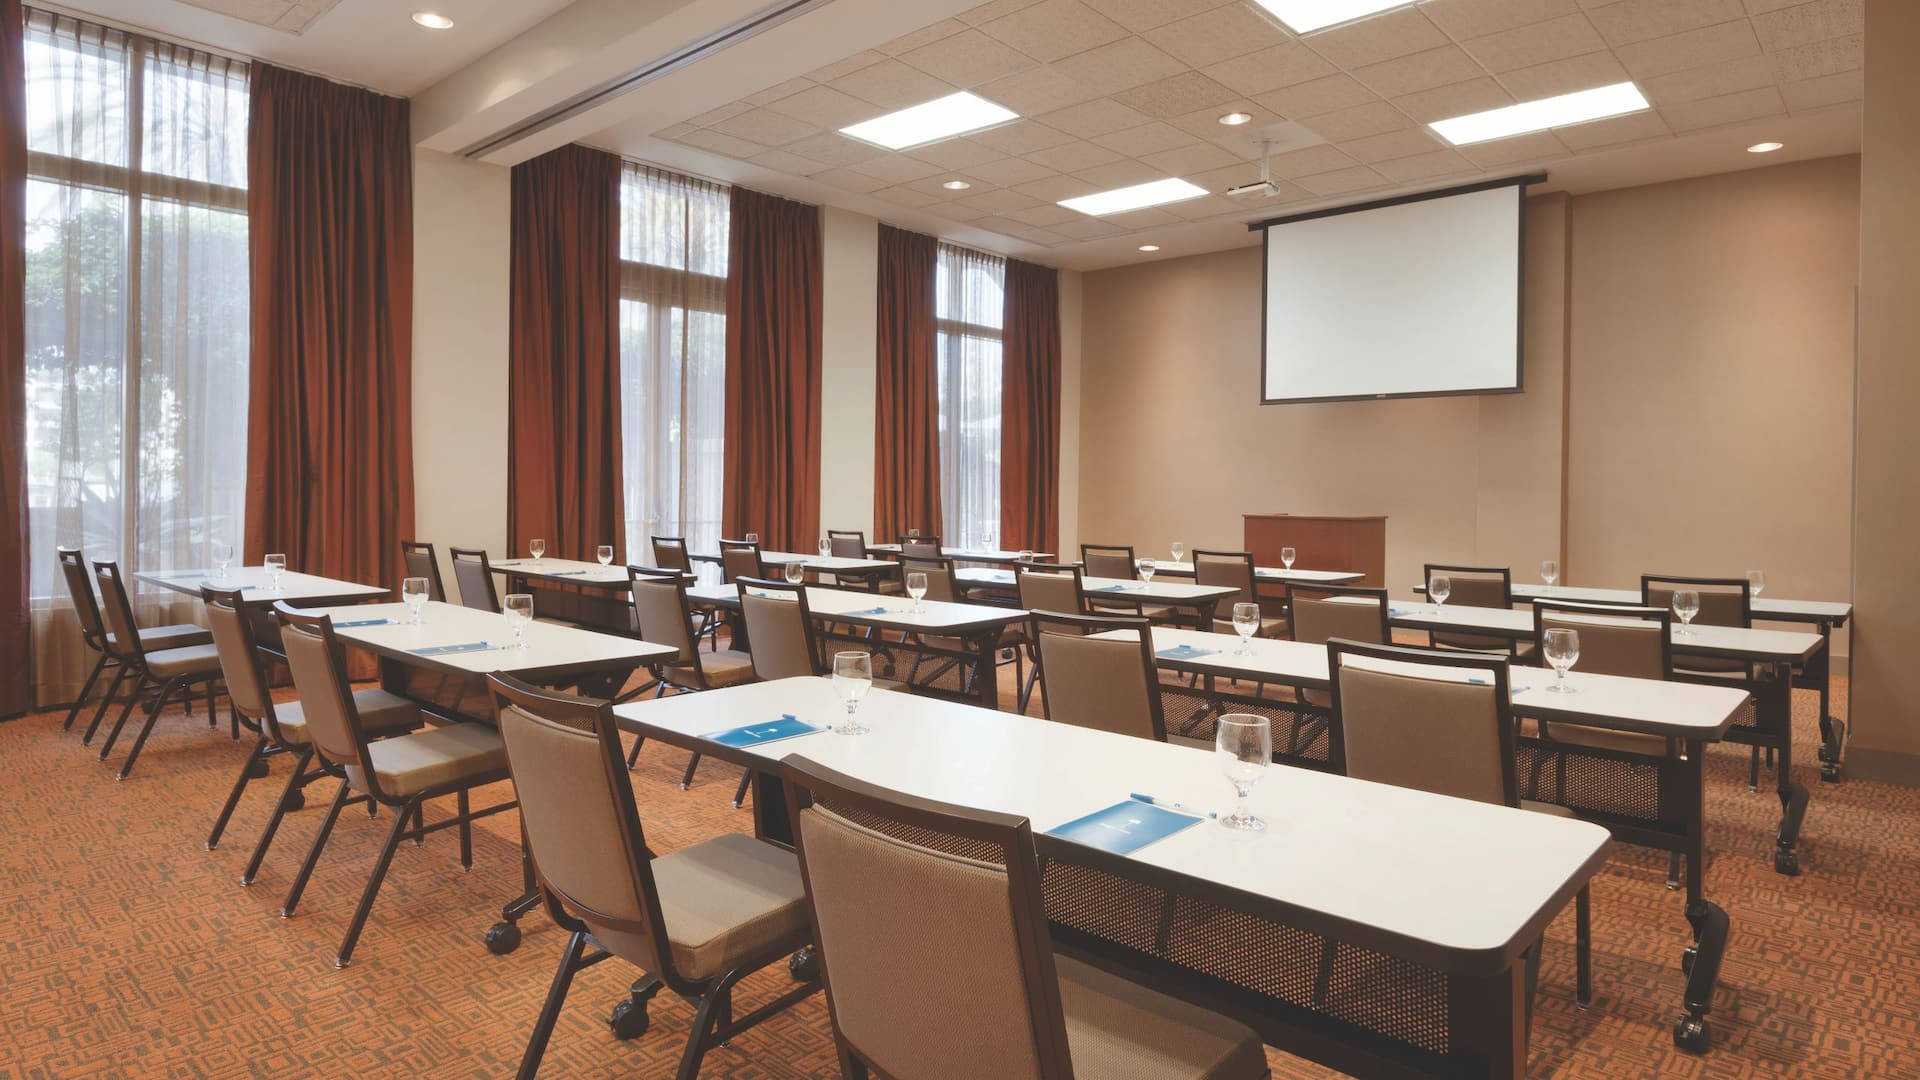 Meeting Room Hyatt House Emeryville / San Francisco Bay Area